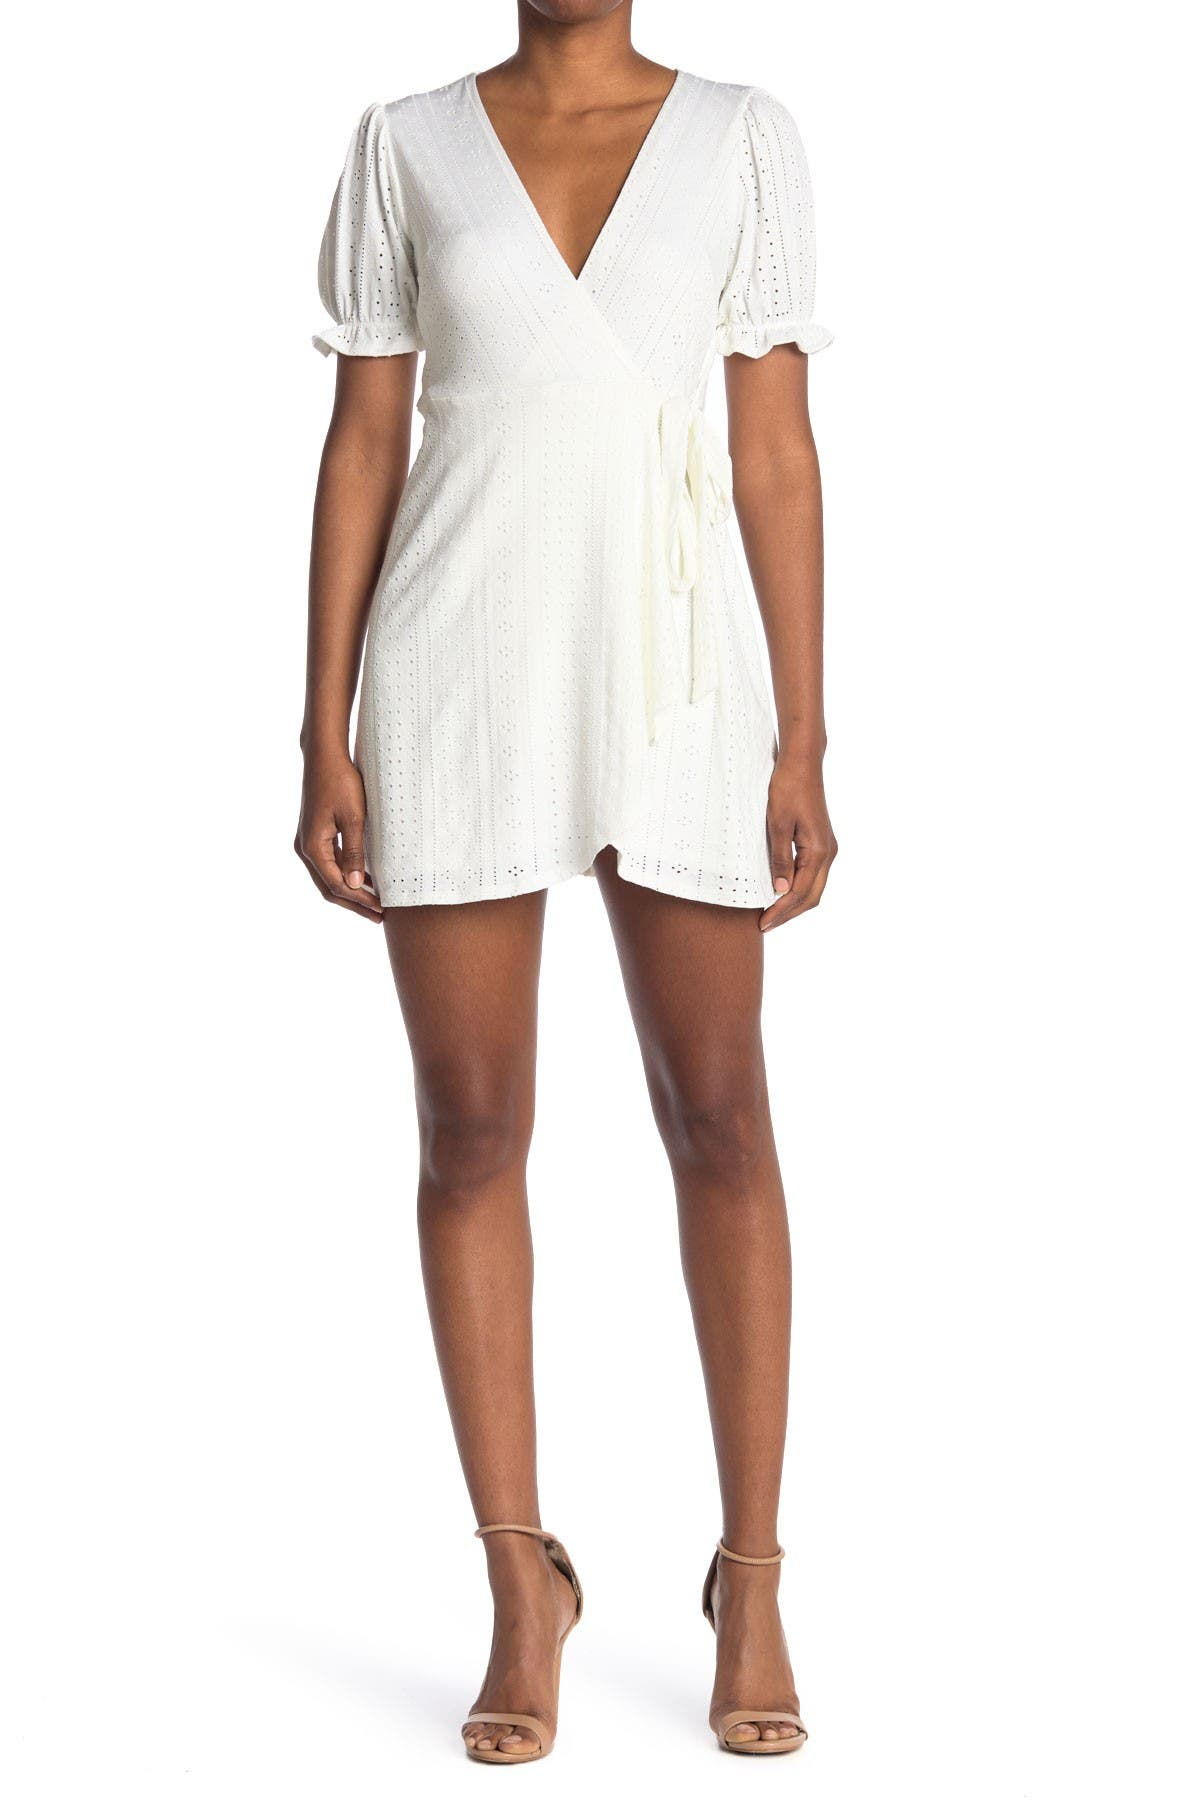 Image of BCBGeneration Puff Sleeve Pointelle Knit Wrap Dress